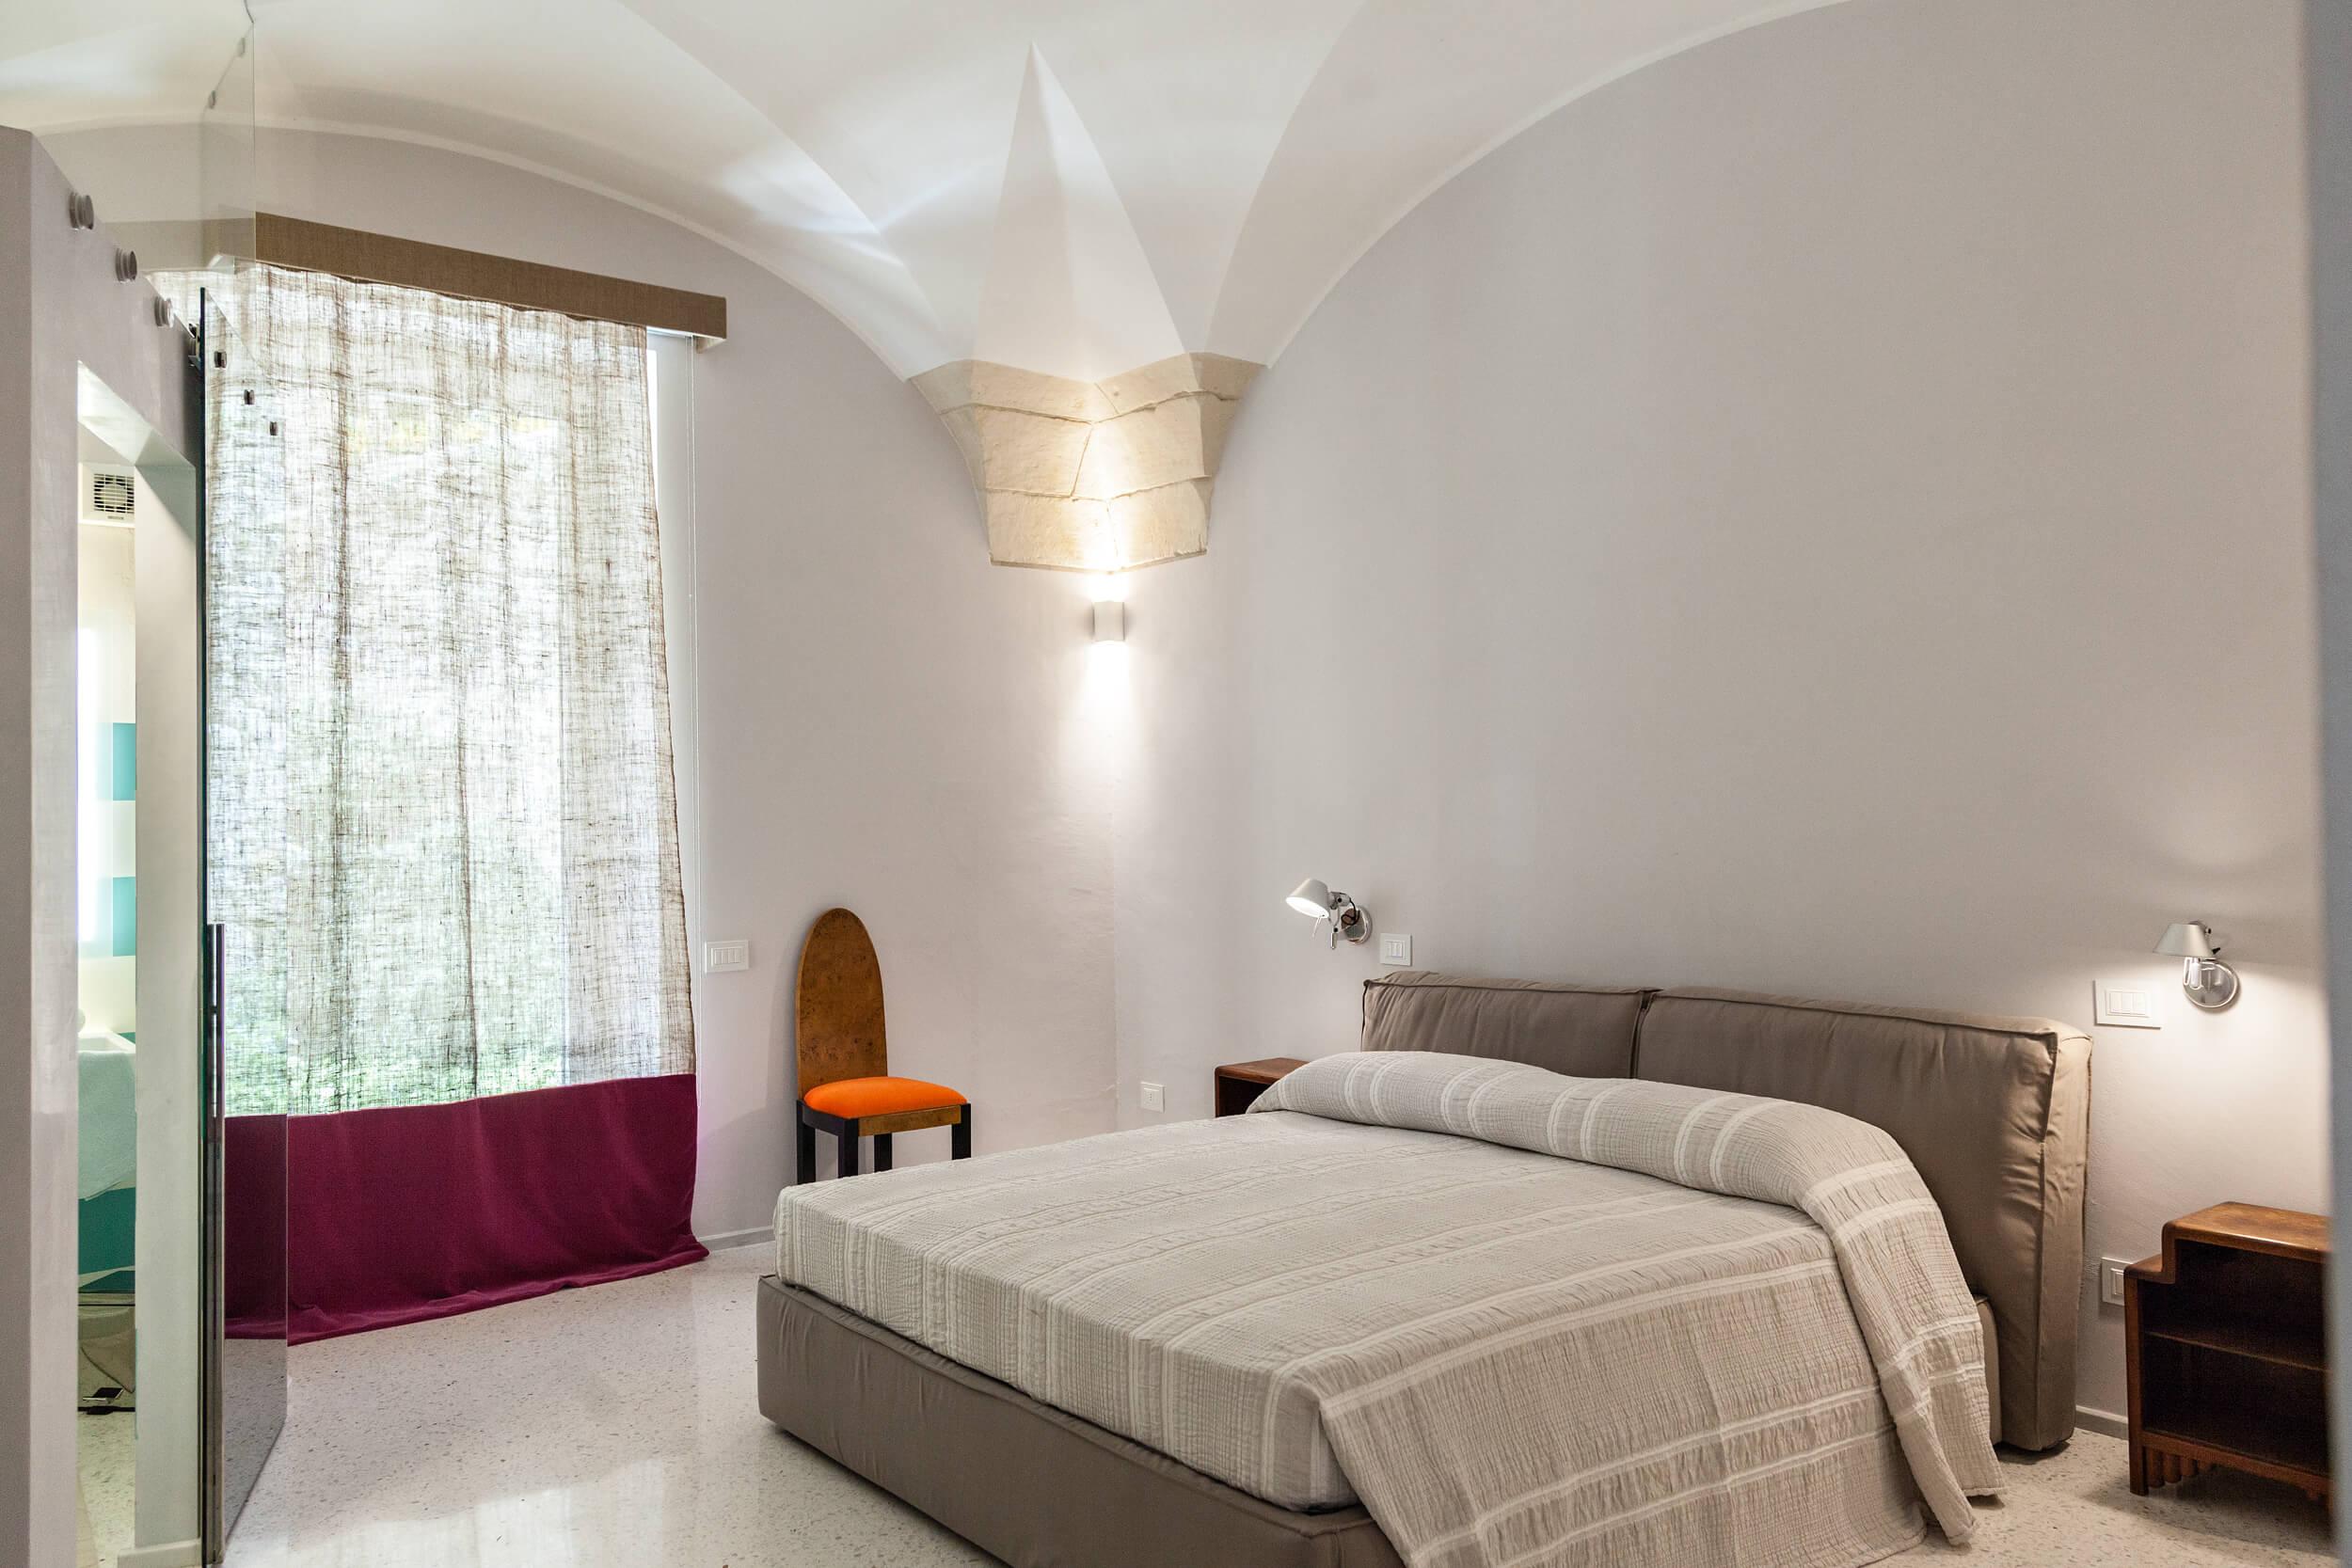 luxury suites, hotel, Lecce Puglia, Apulia